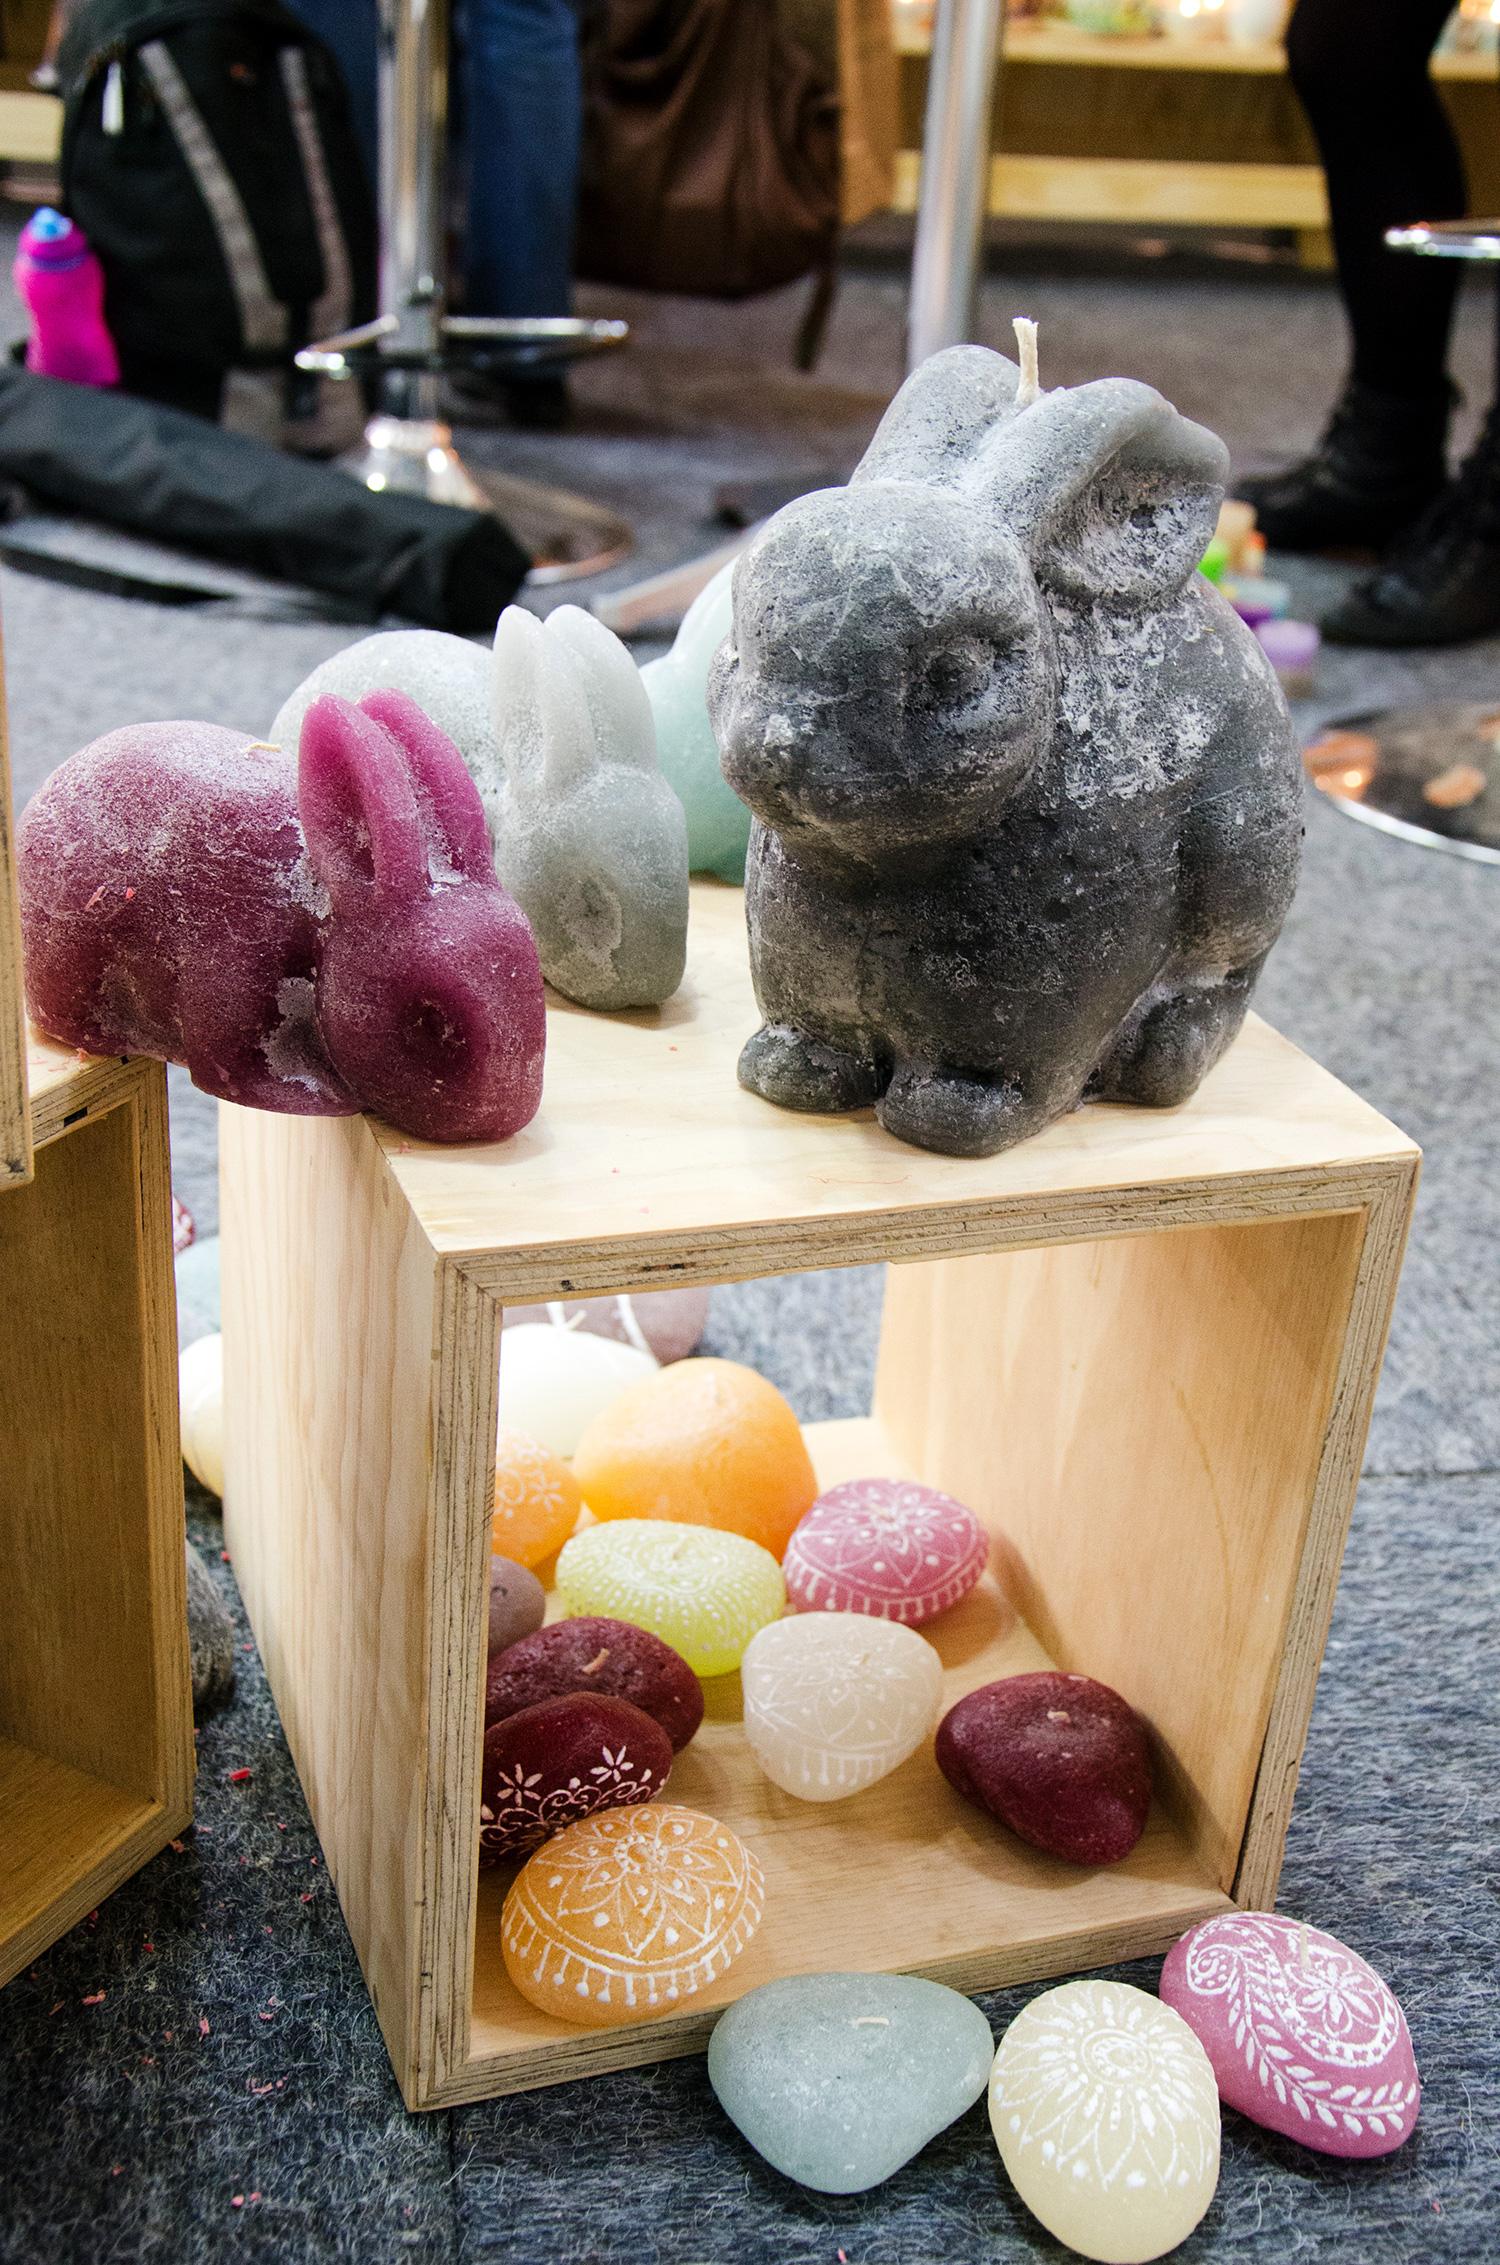 kapula-handmade-figurine-candles-bunny-rabbit-pebbles.jpg